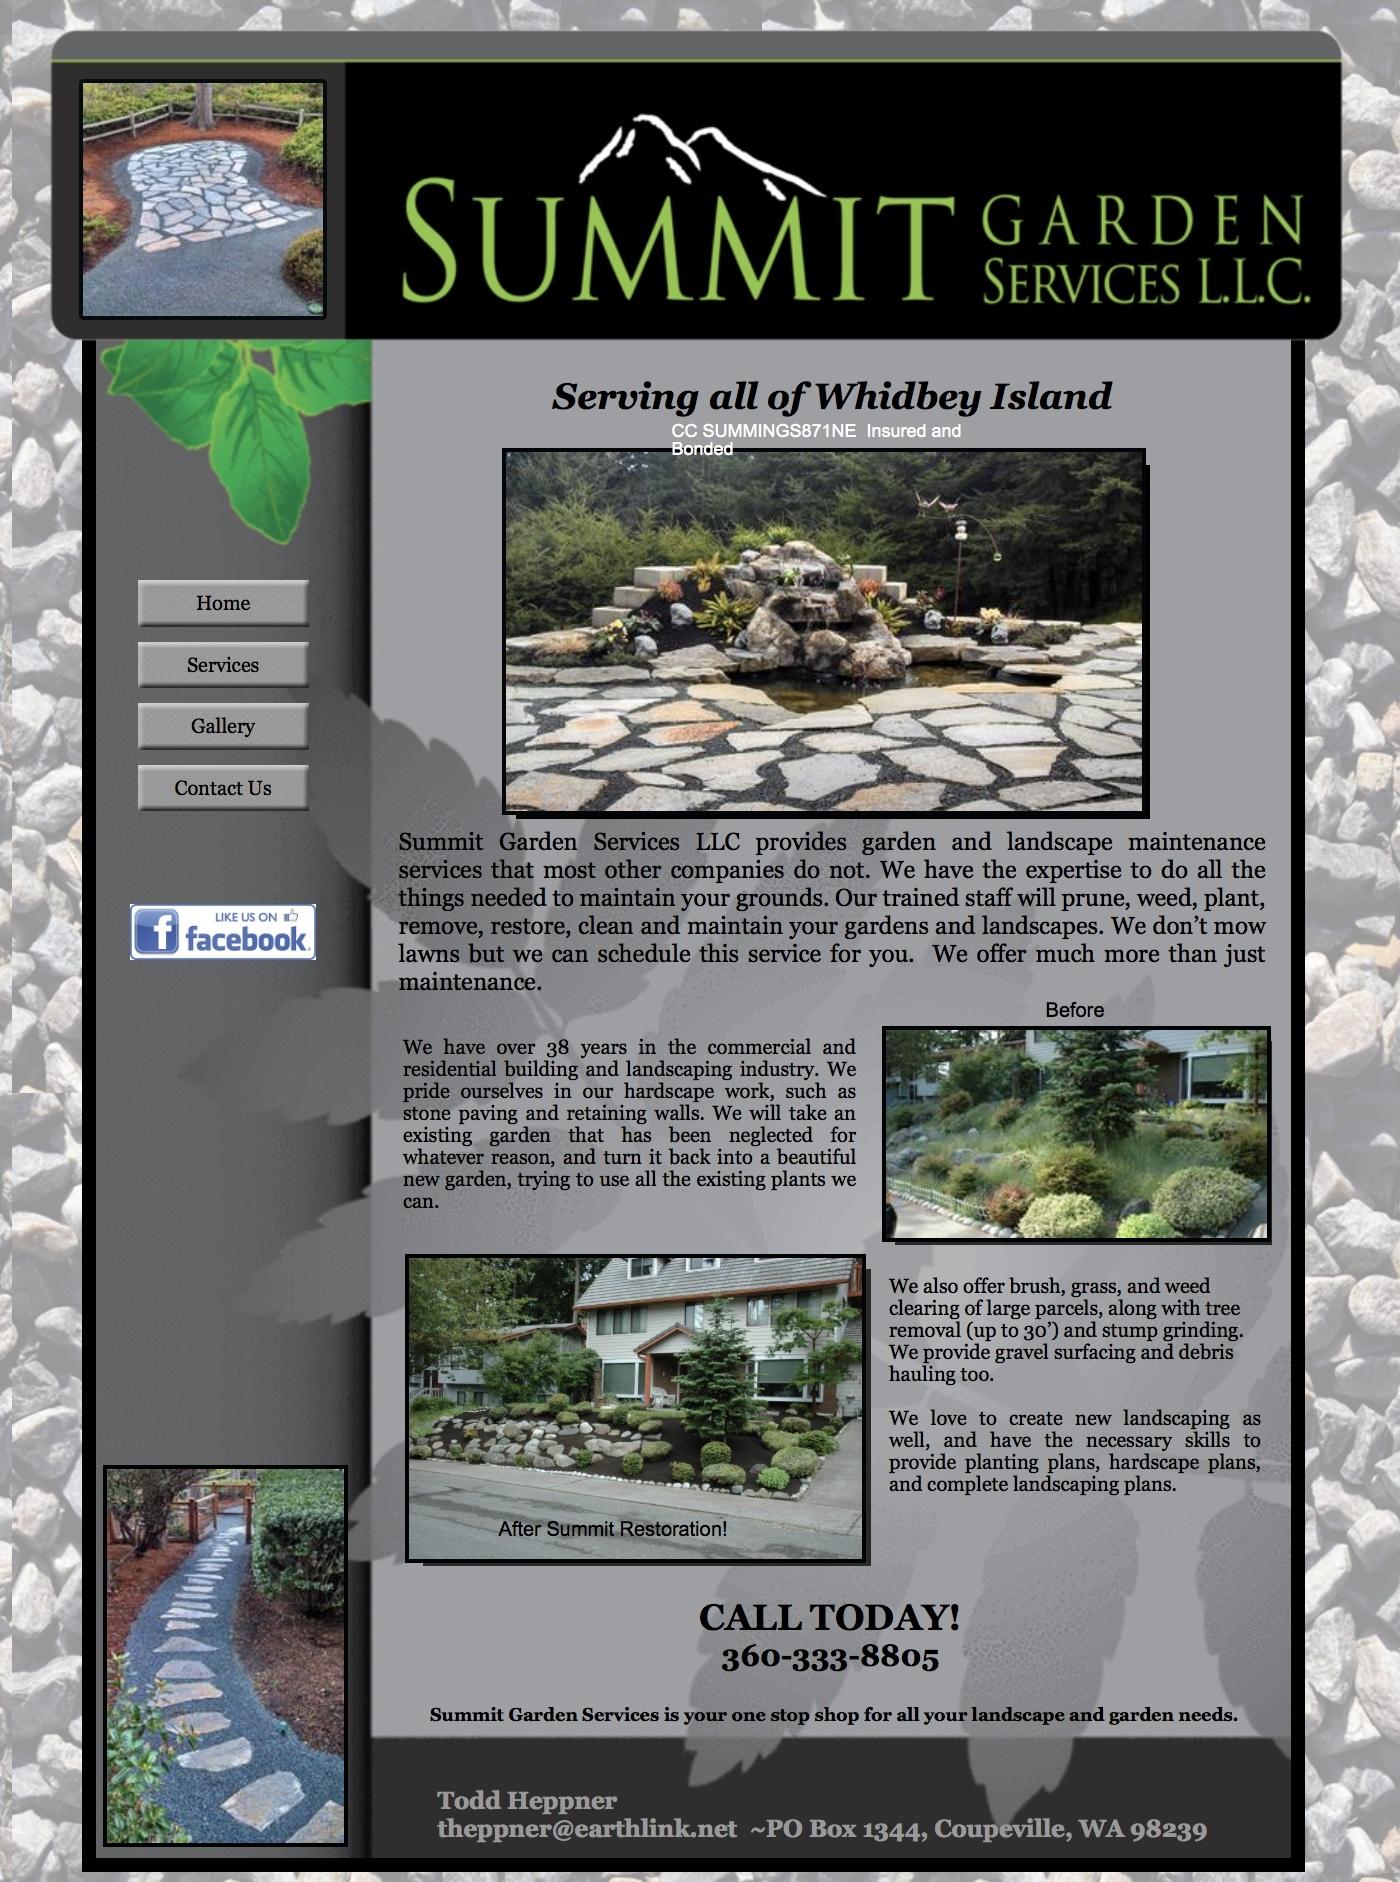 www.summitgardenservicesllc.com